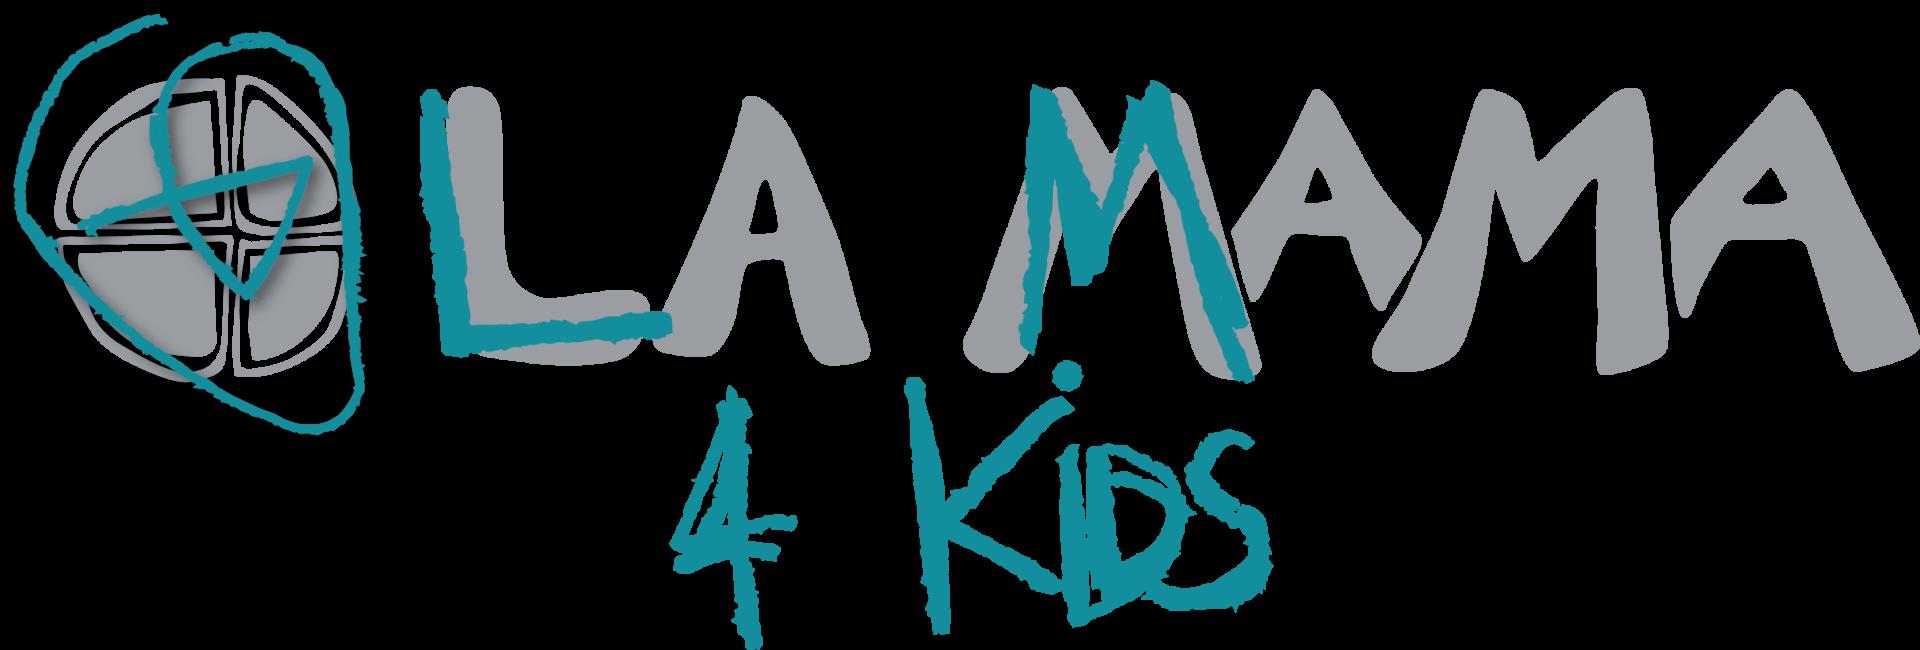 La Mama for kids logo